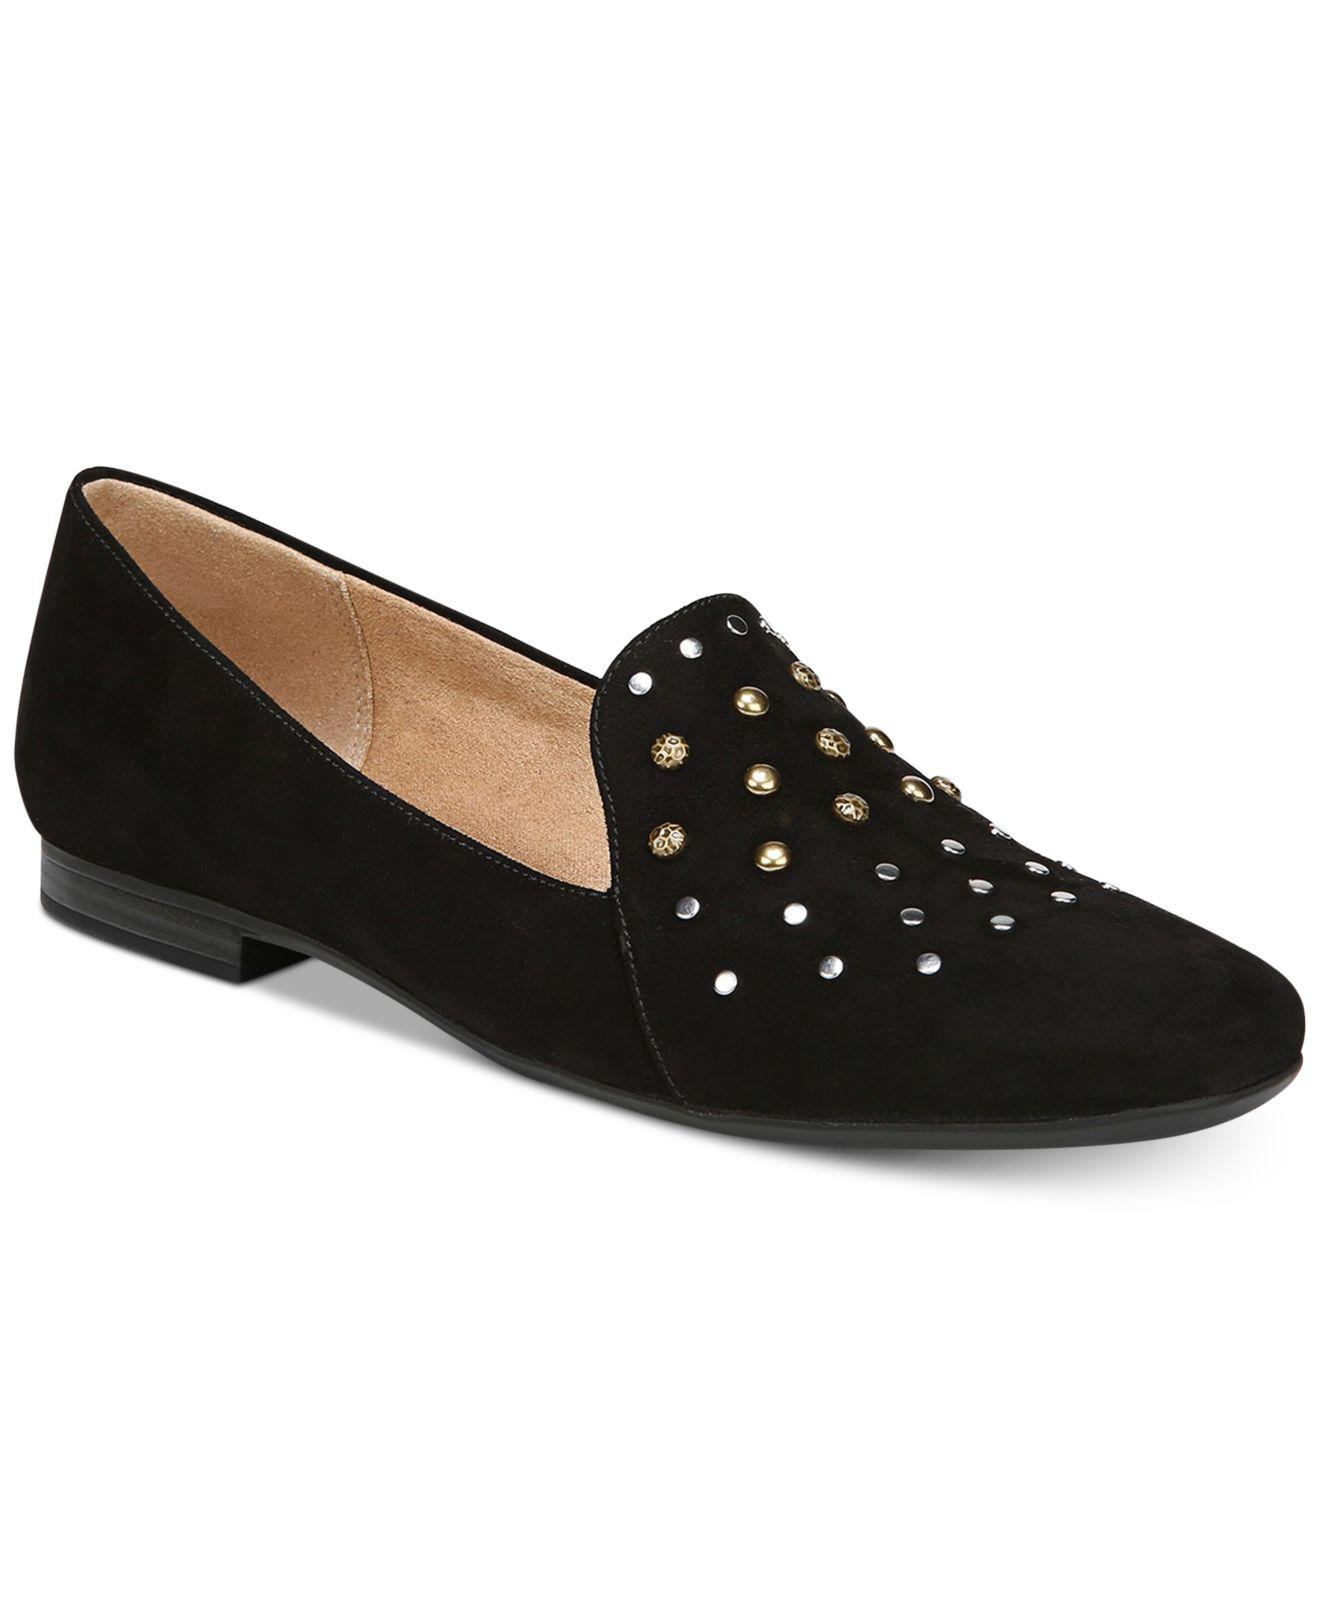 Emiline 4 Studded Loafers y1vgMy9gb2